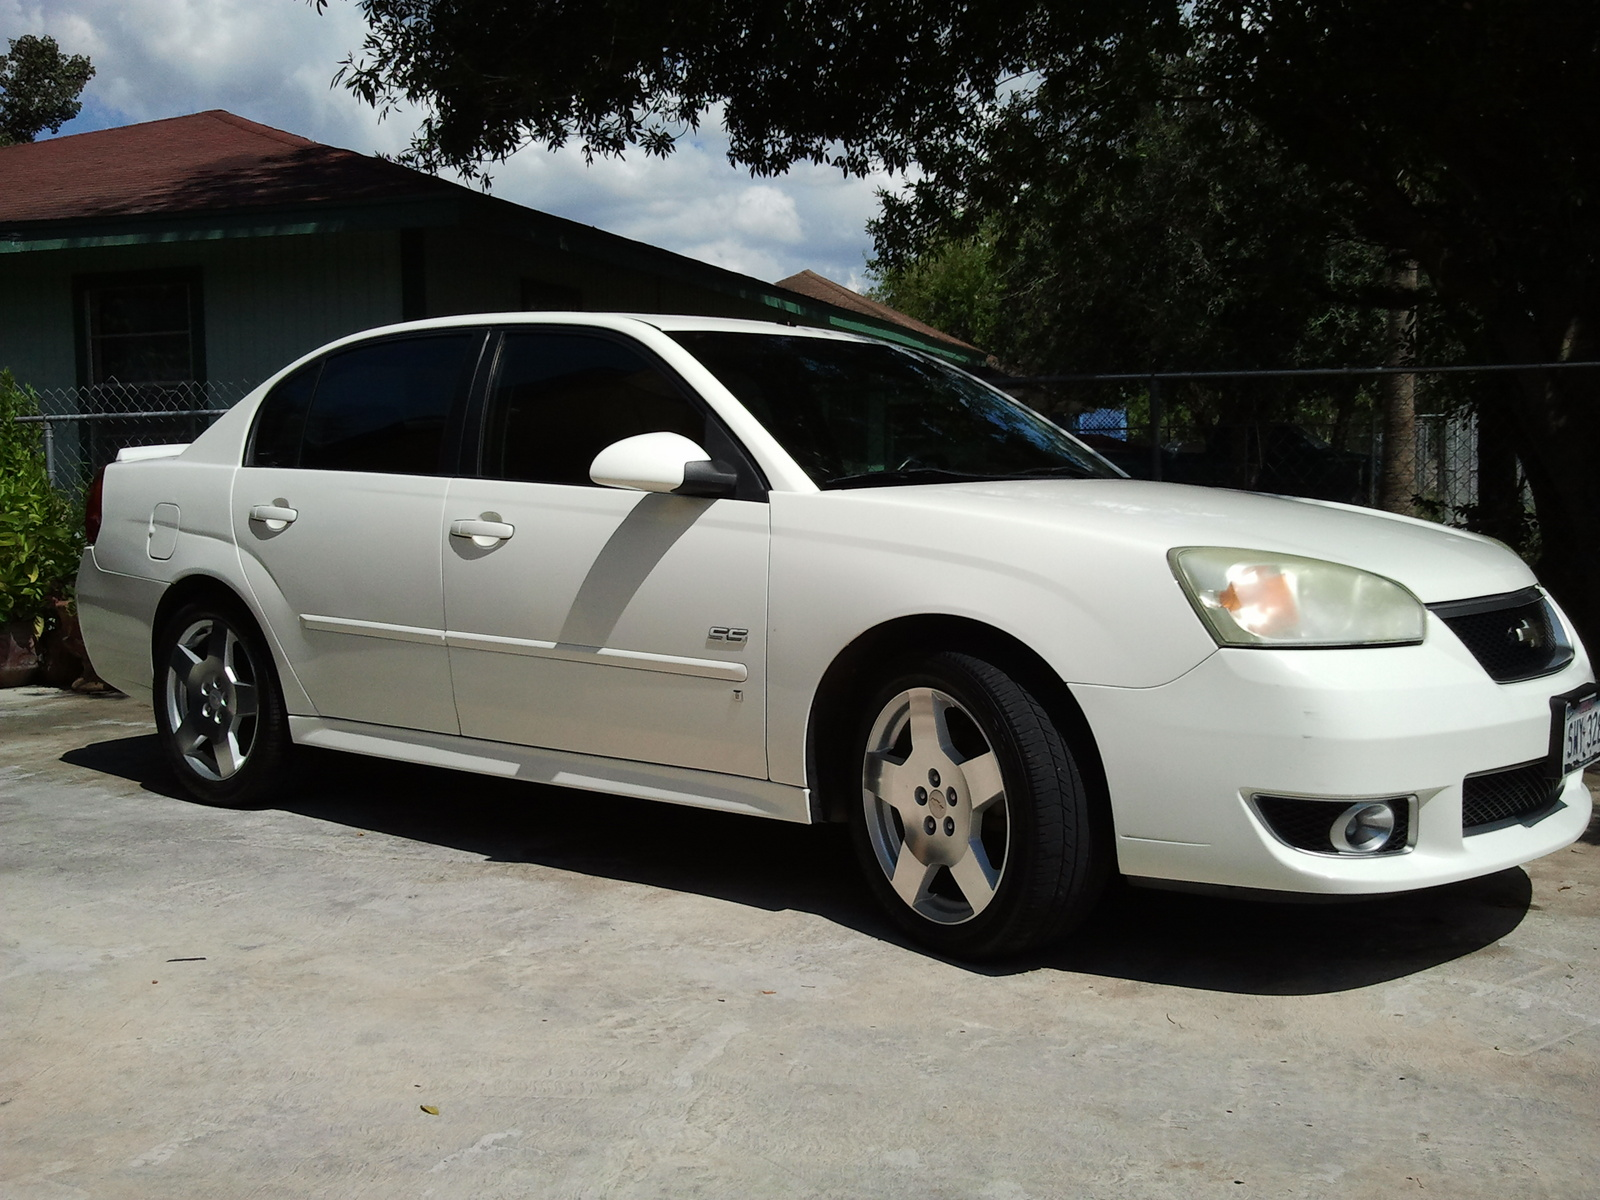 2006 Chevrolet Malibu - Pictures